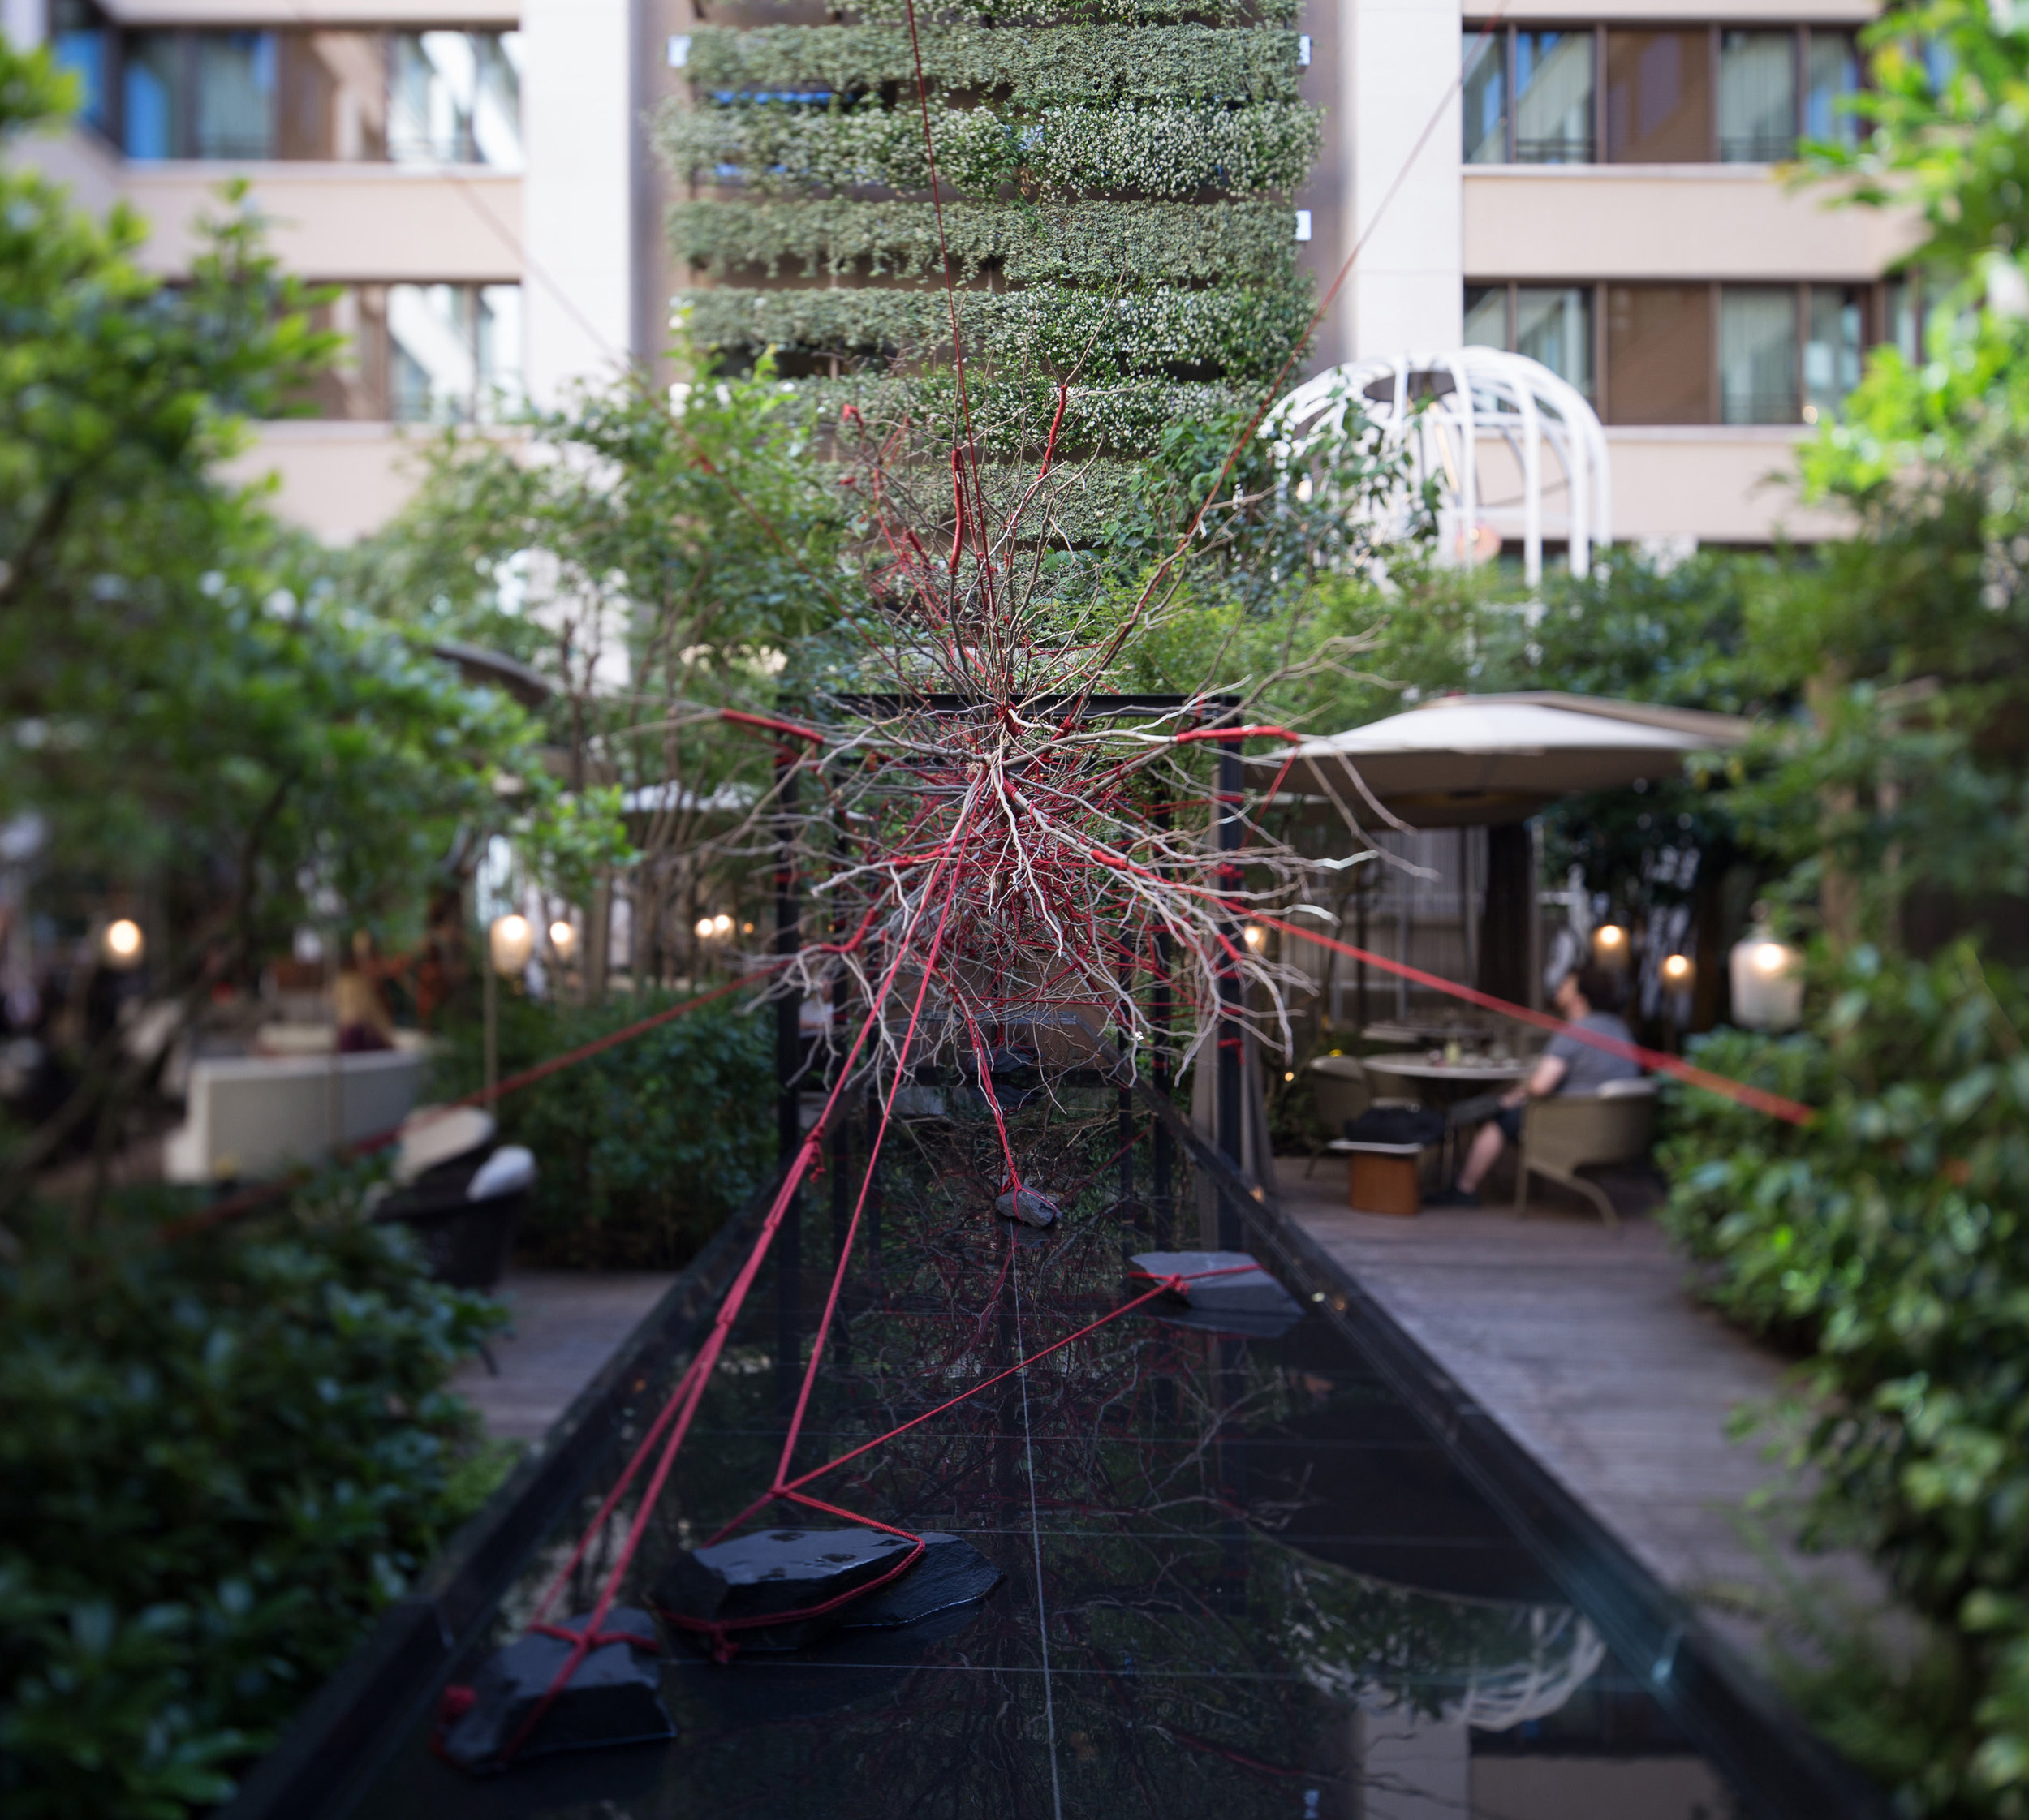 The Red Garden / Hotel Mandarin Oriental Paris   Design of an unusual plant installation mixing Tanqueray's elegant world with Shibari, the Japanese binding art.